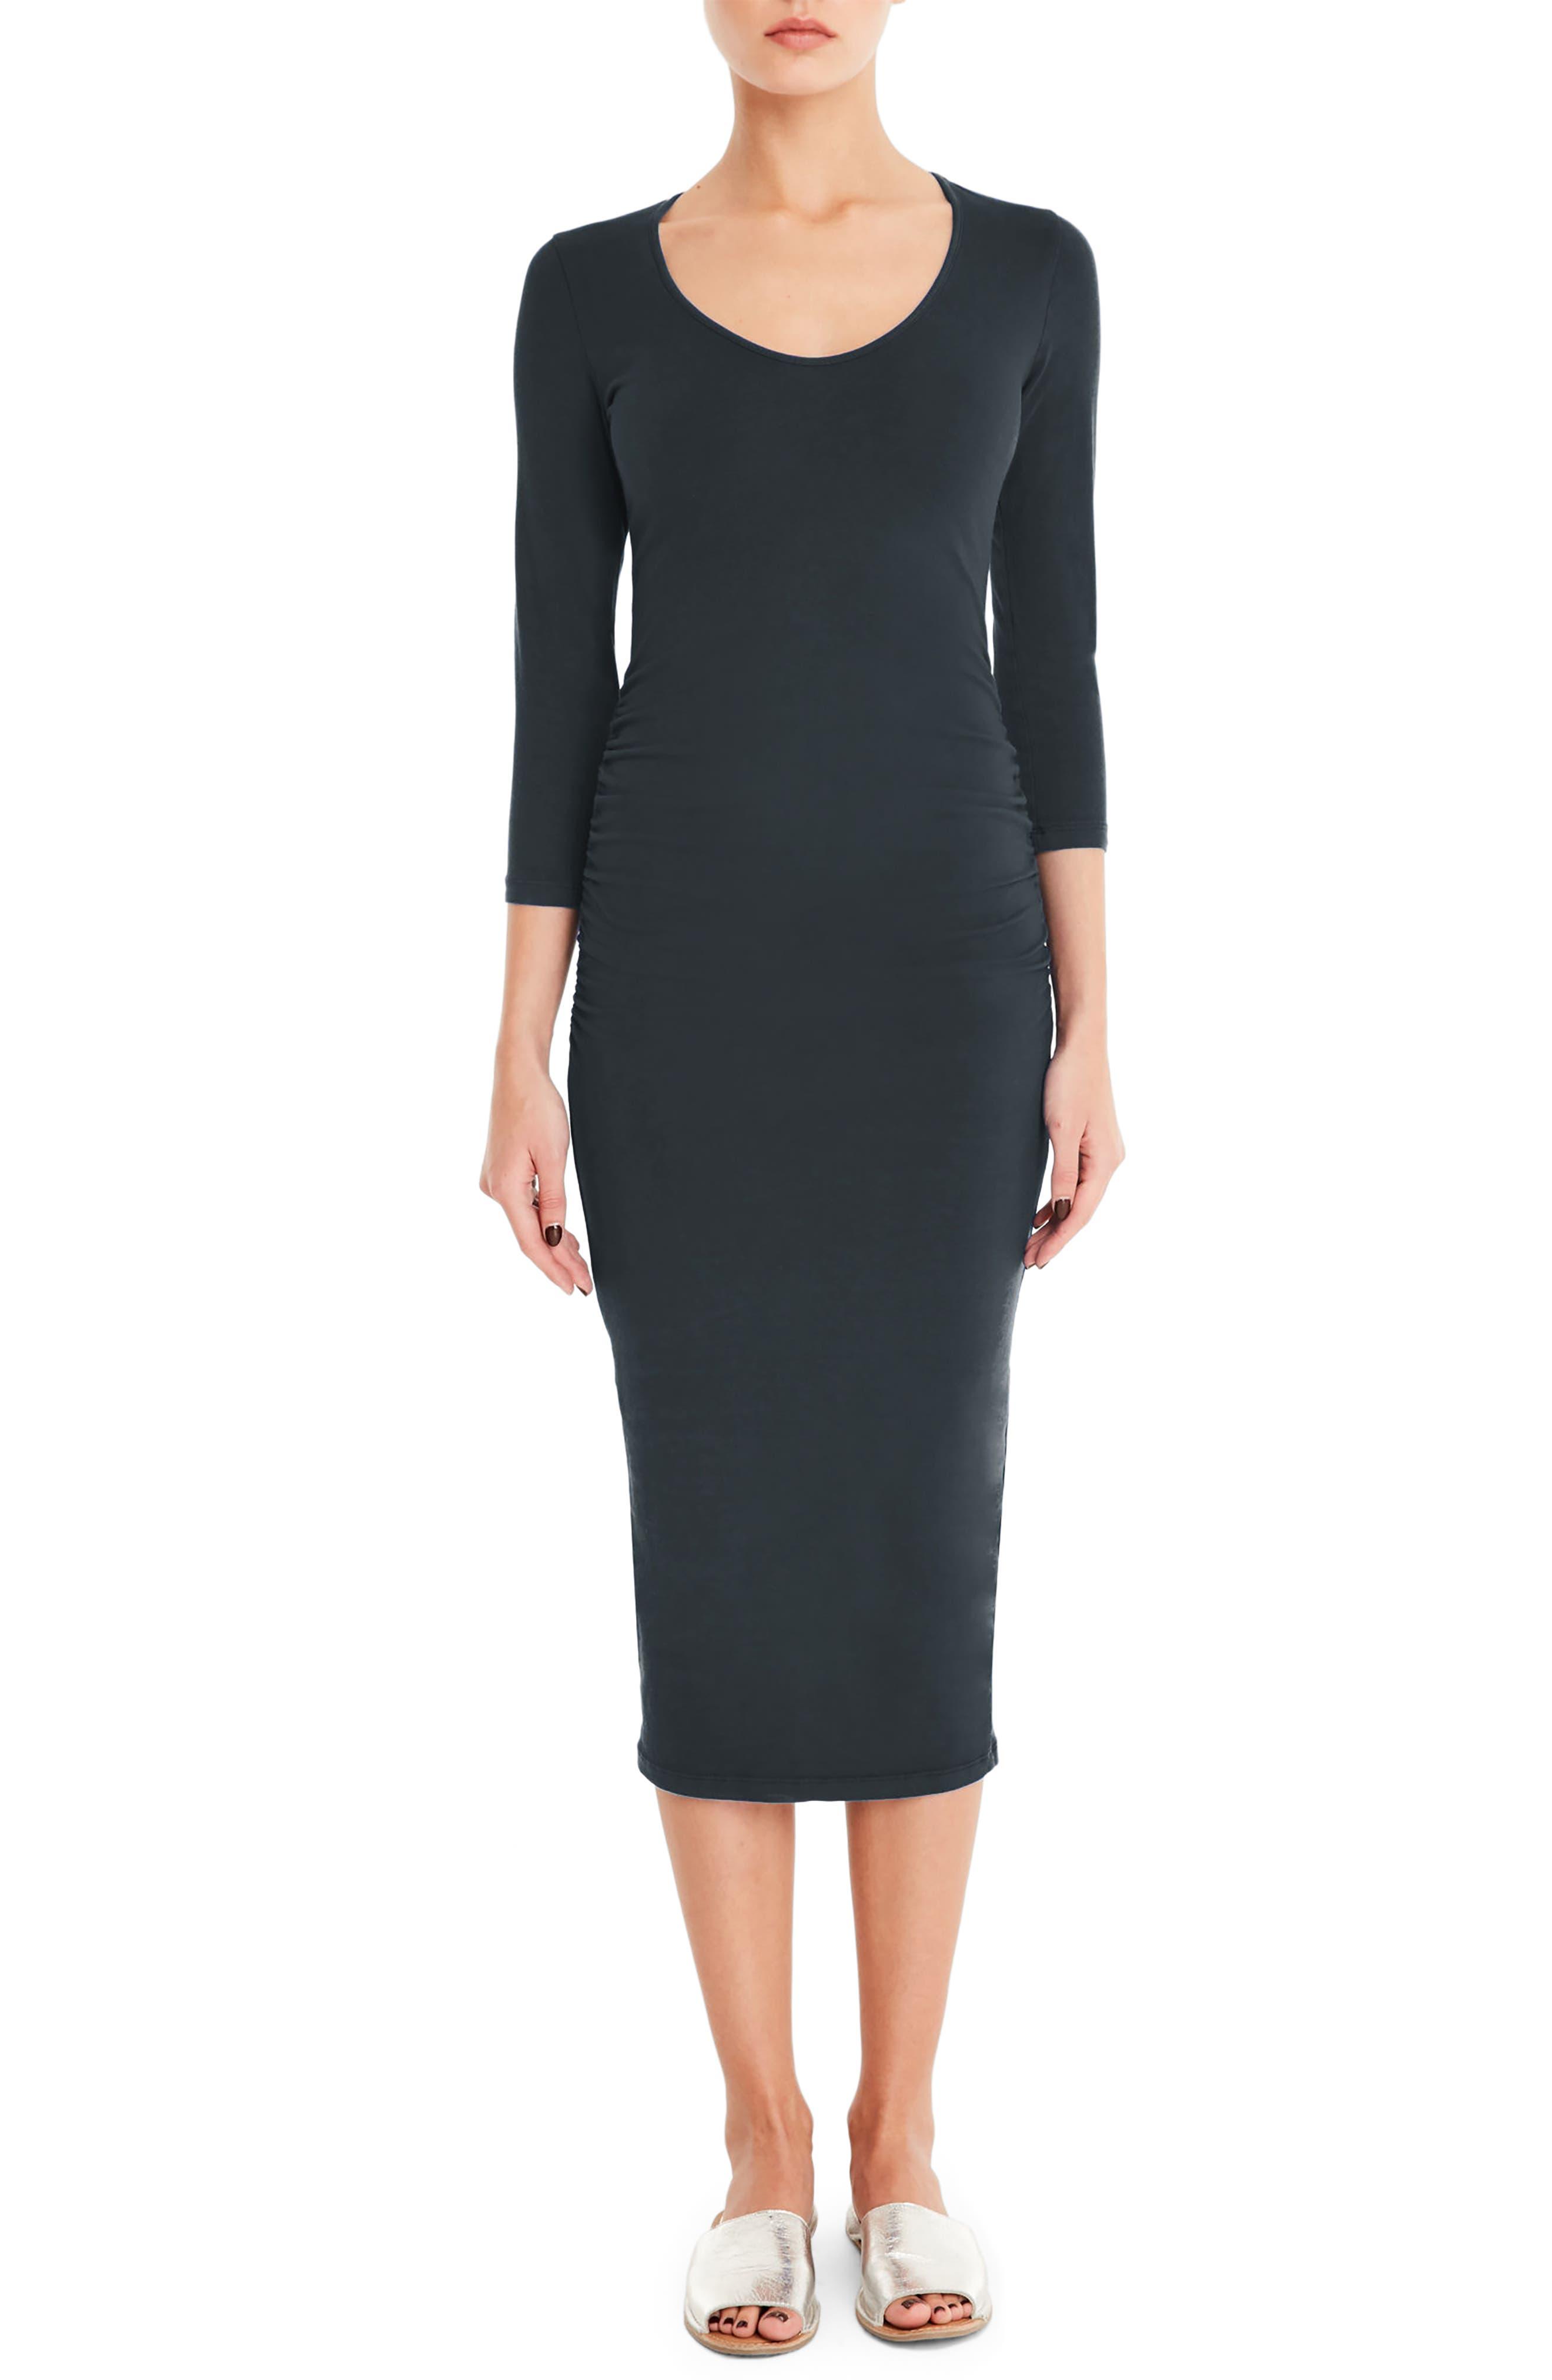 MICHAEL STARS, Ruched Midi Dress, Main thumbnail 1, color, OXIDE